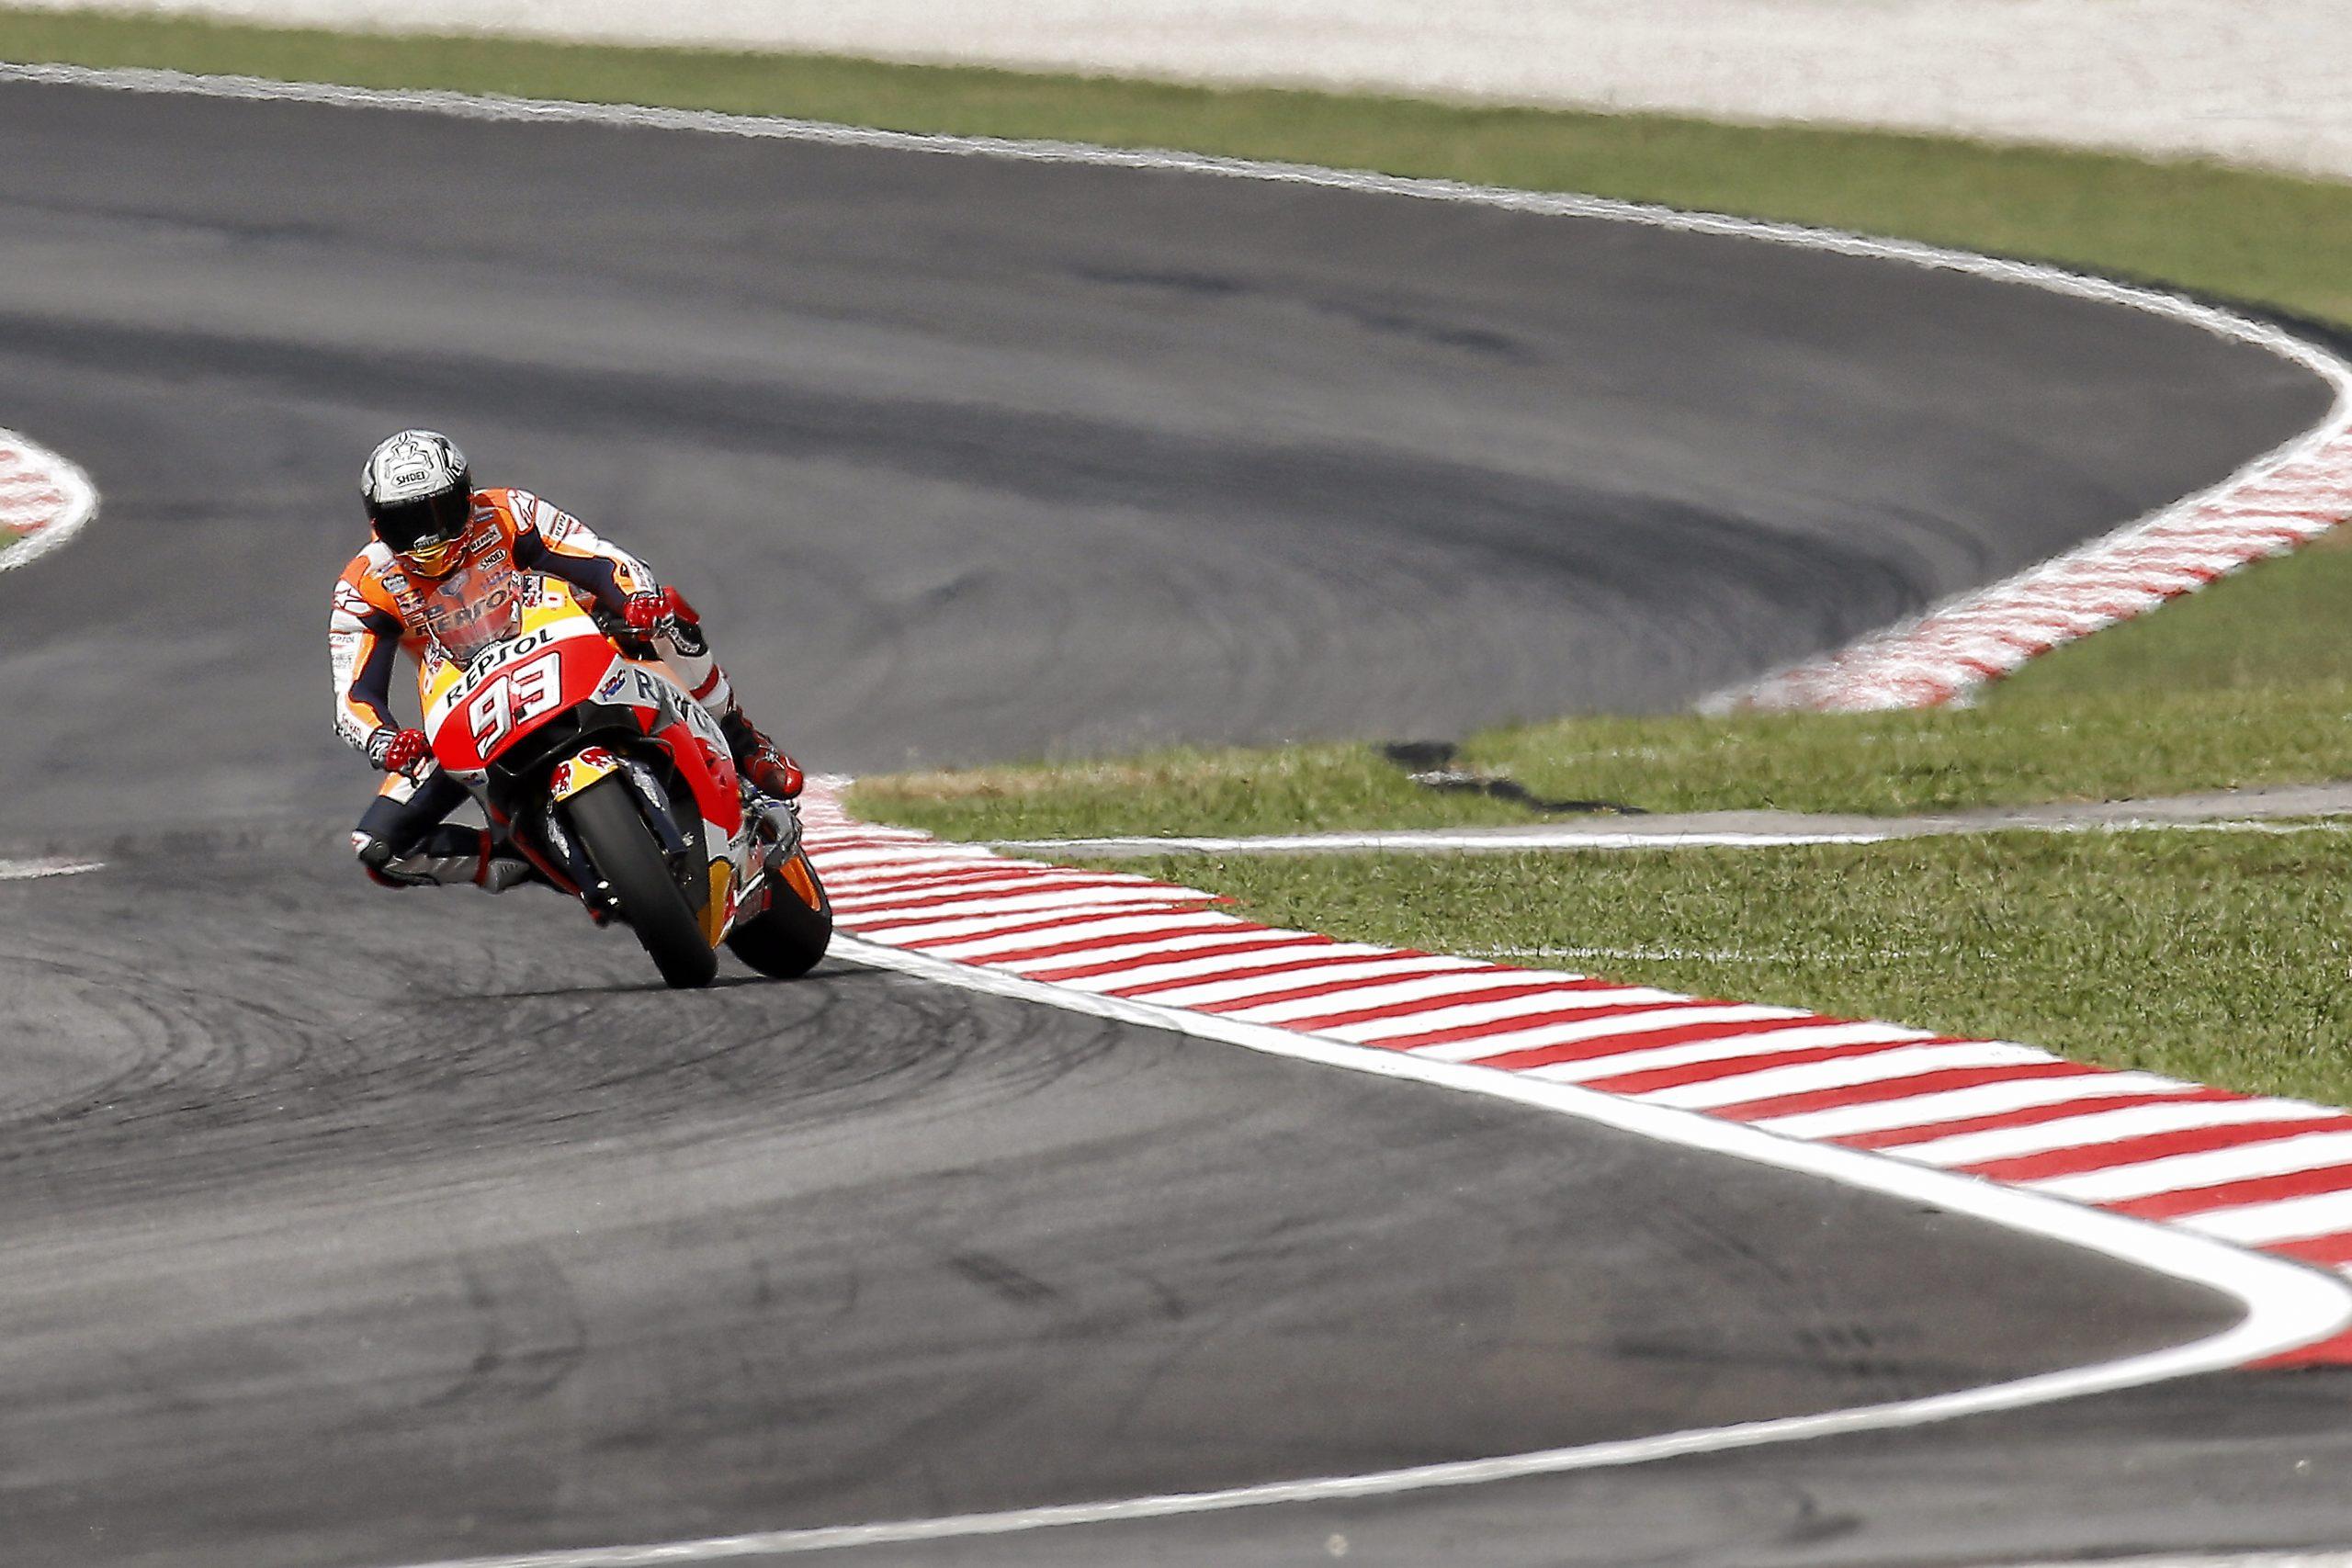 Gran Premio de Malasia cancelado. Entra Misano.